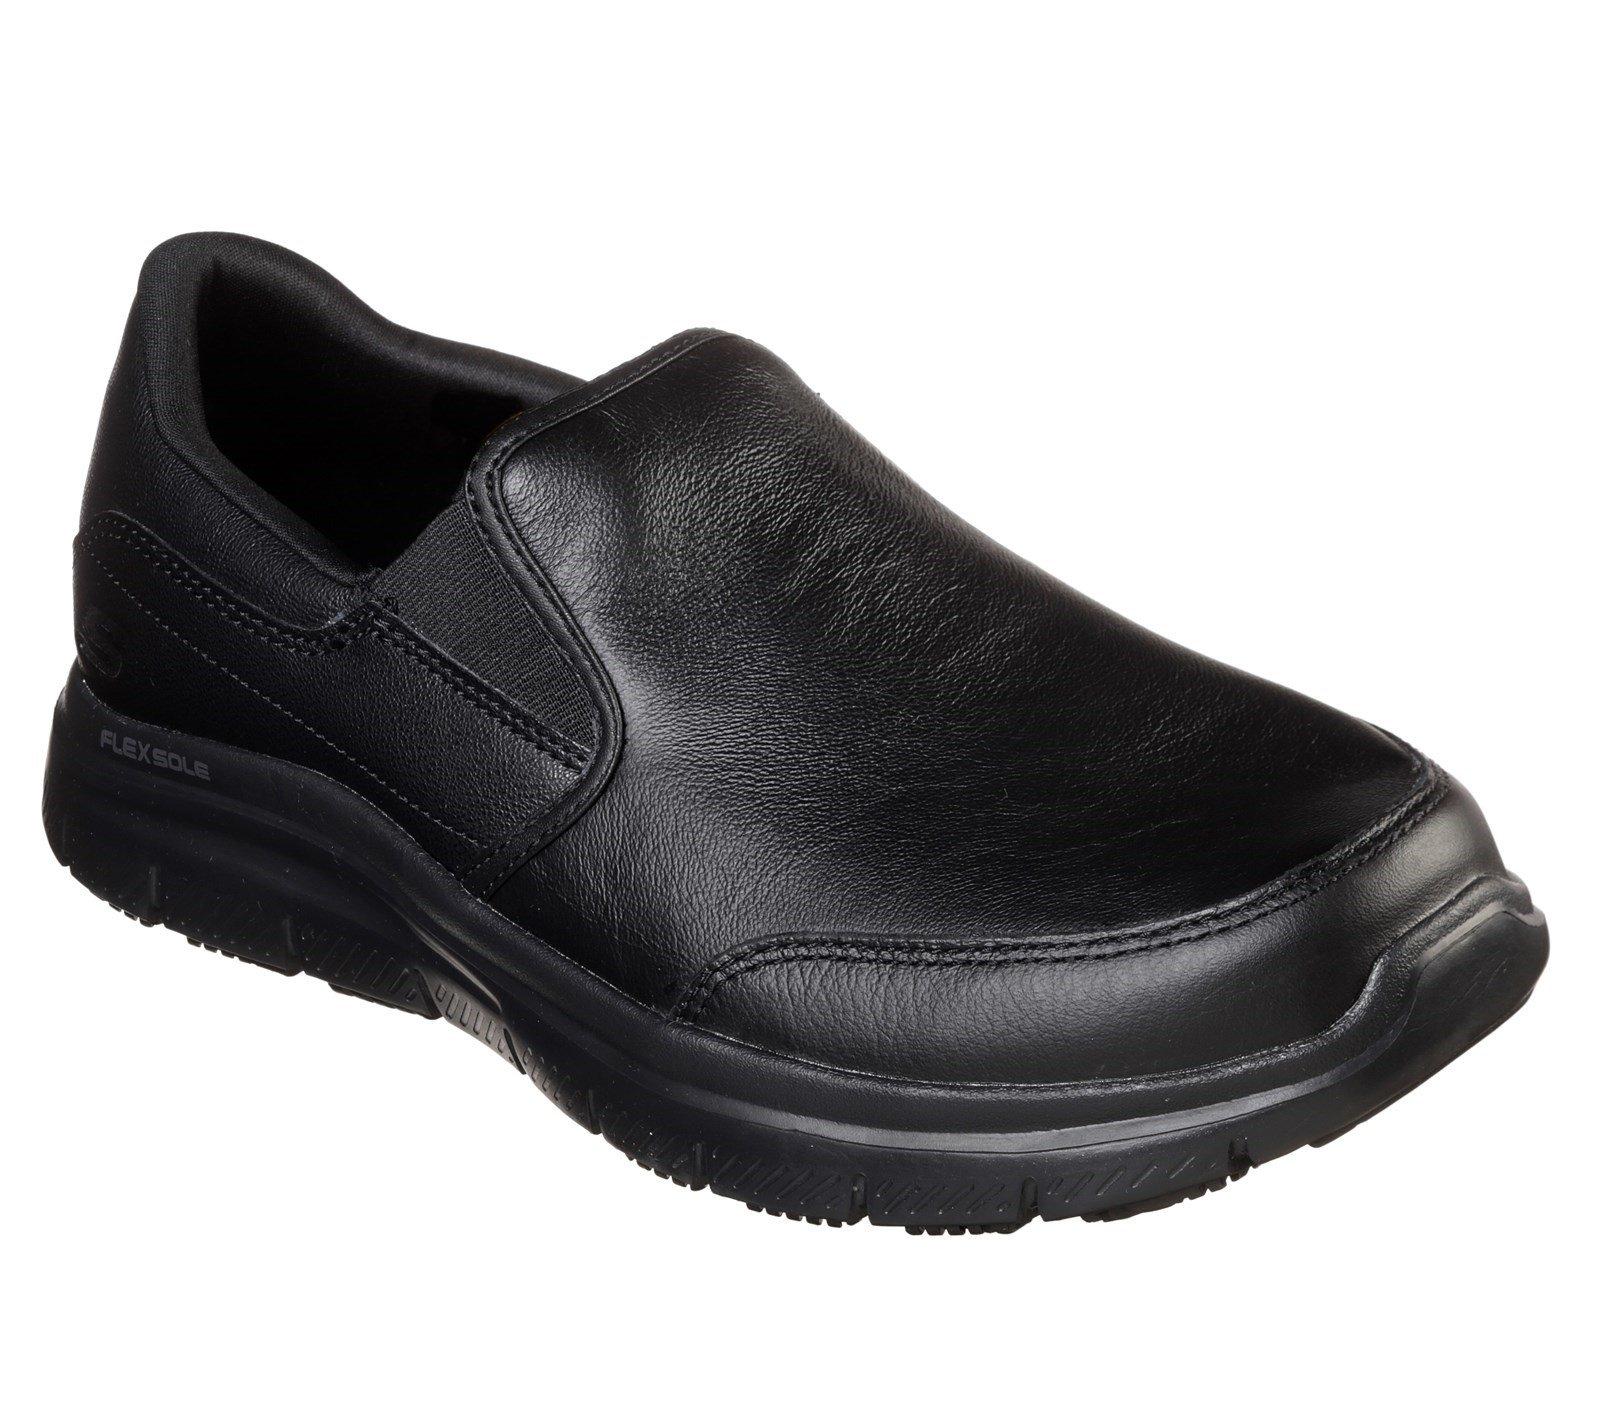 Skechers Unisex Bronwood Wide Slip Trainer Black 32950 - Black 6